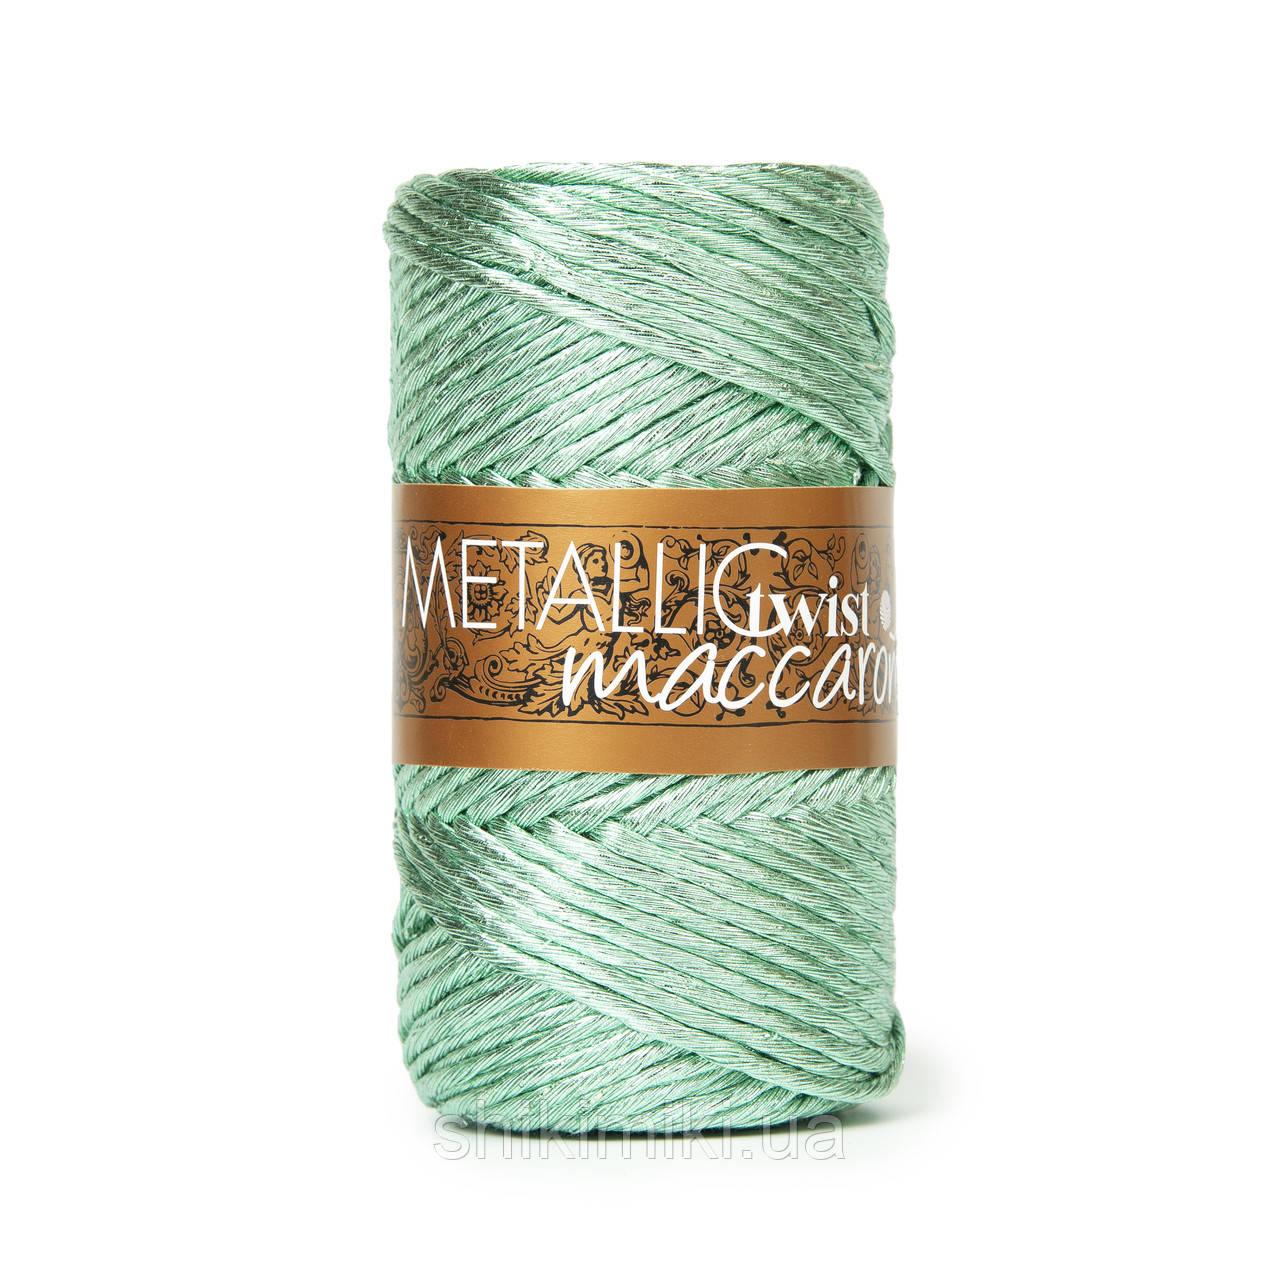 Фантазийный шнур Maccaroni Metallic Twist, цвет мятный